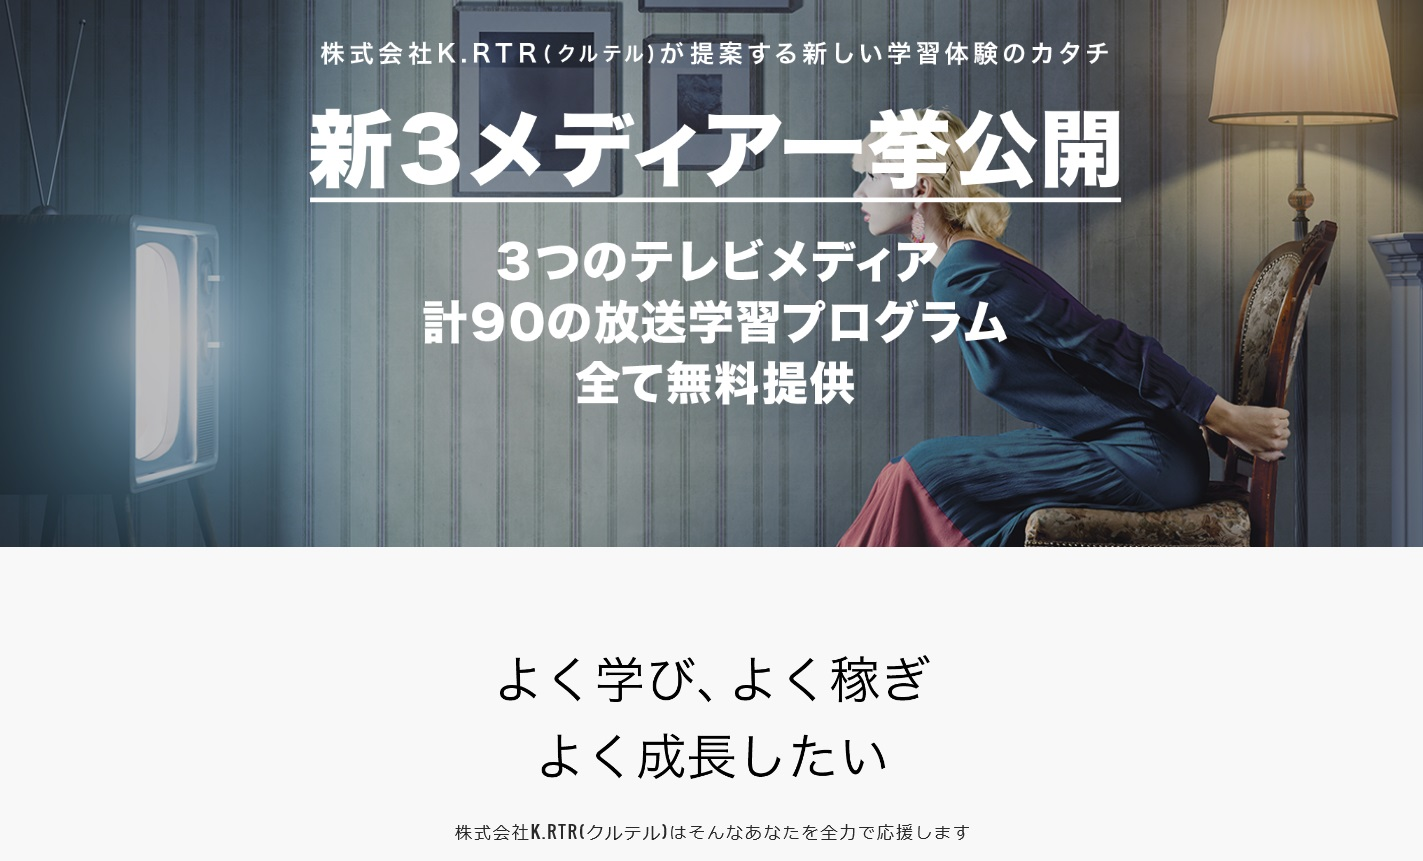 K.RTR 新3メディア一挙公開